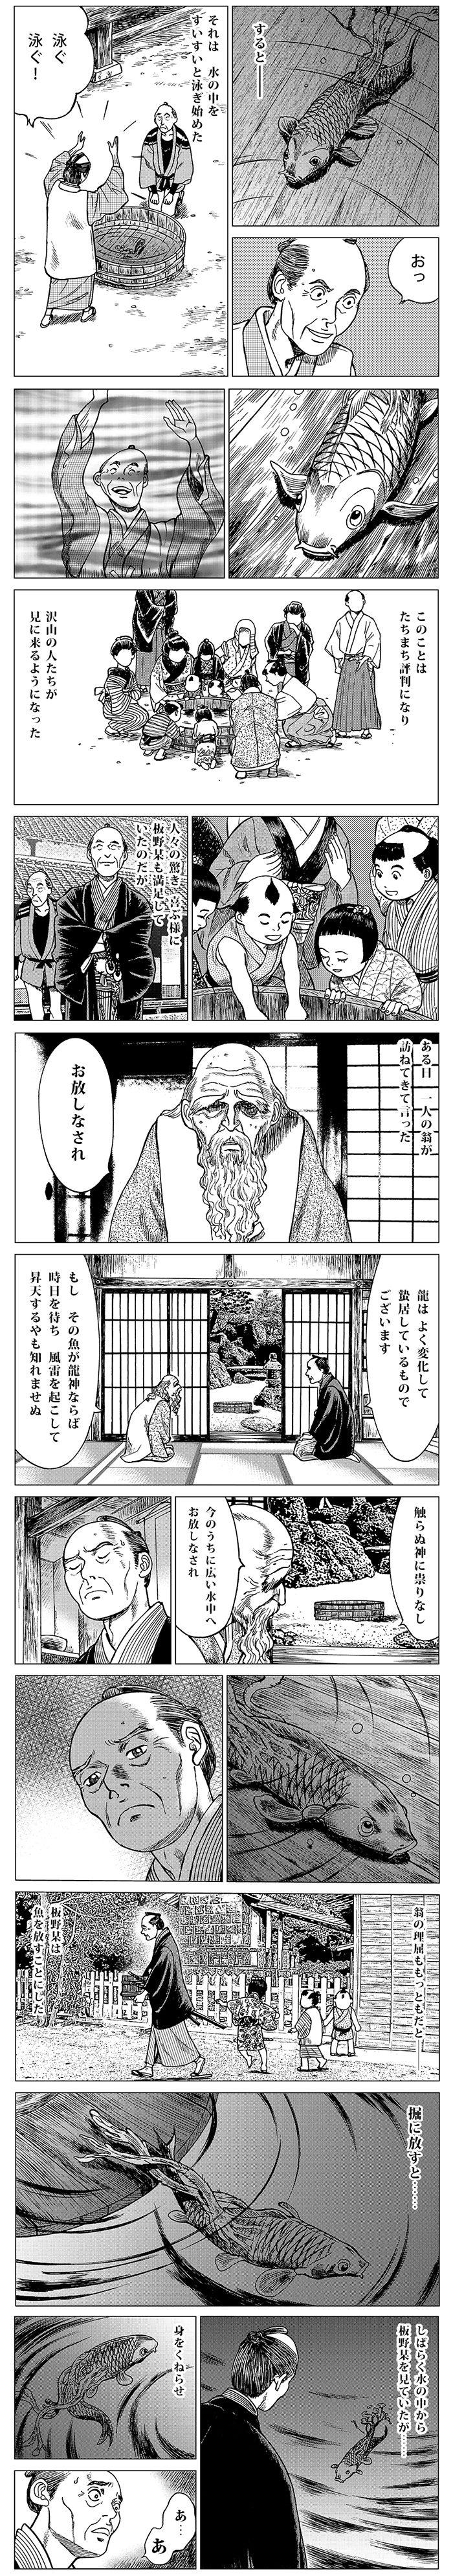 ayakashi-henka-2